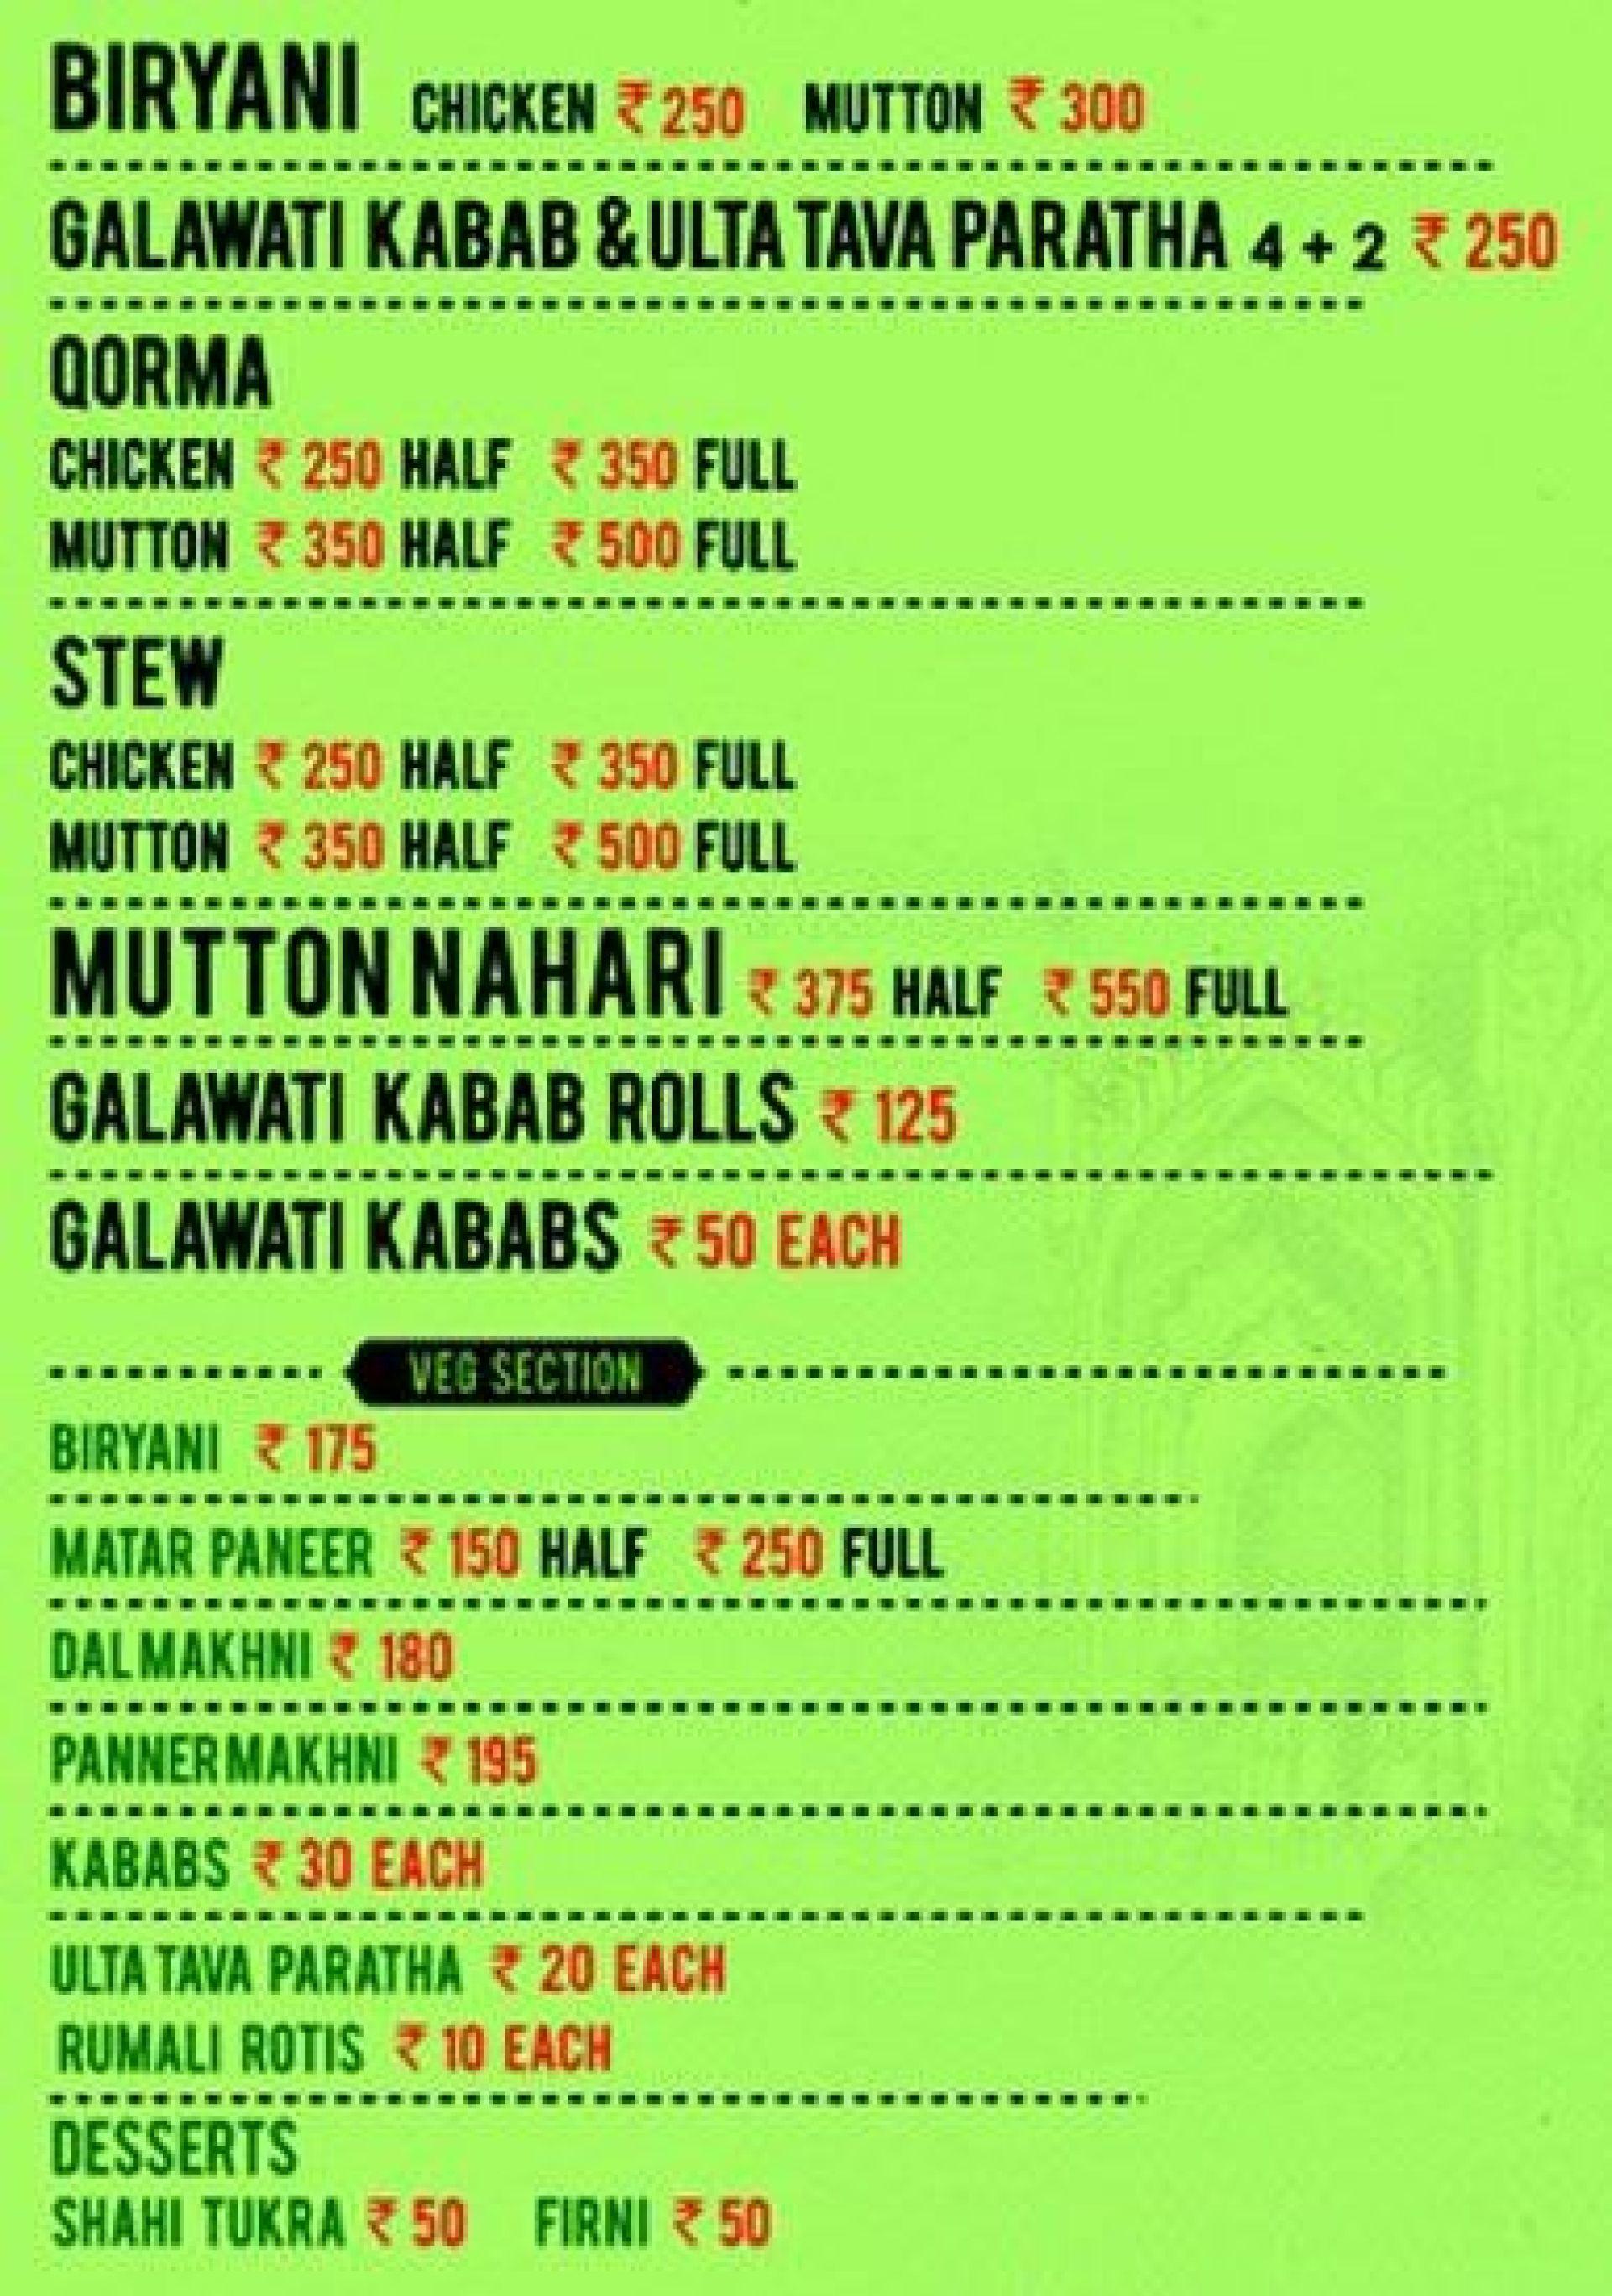 menu menu of the rumis kitchen - Rumis Kitchen Menu